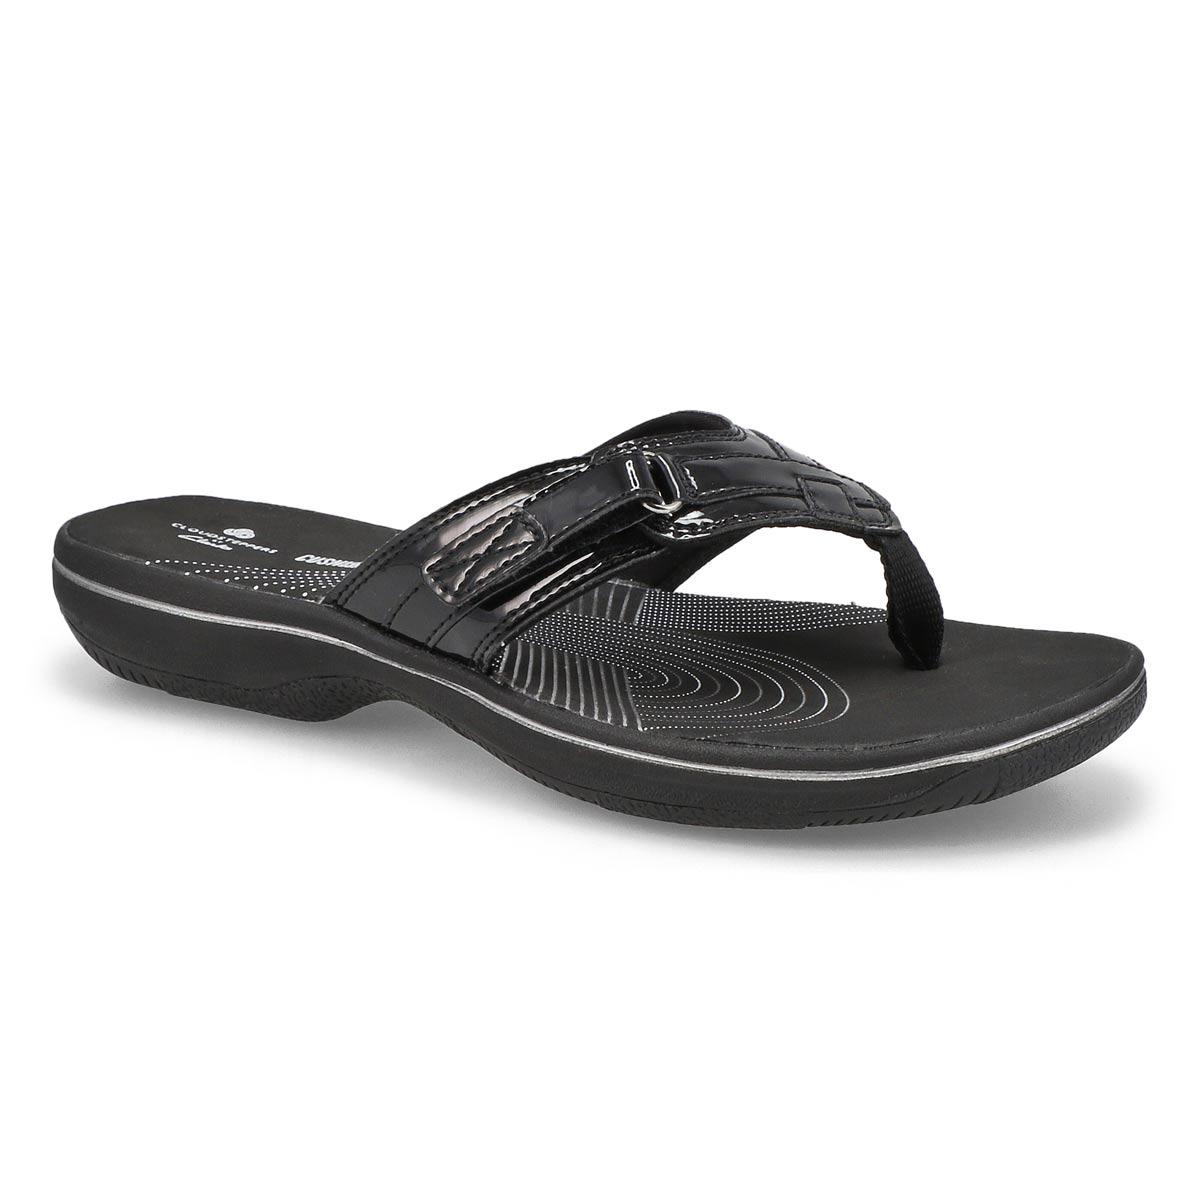 Women's BREEZE SEA black patent thong sandals